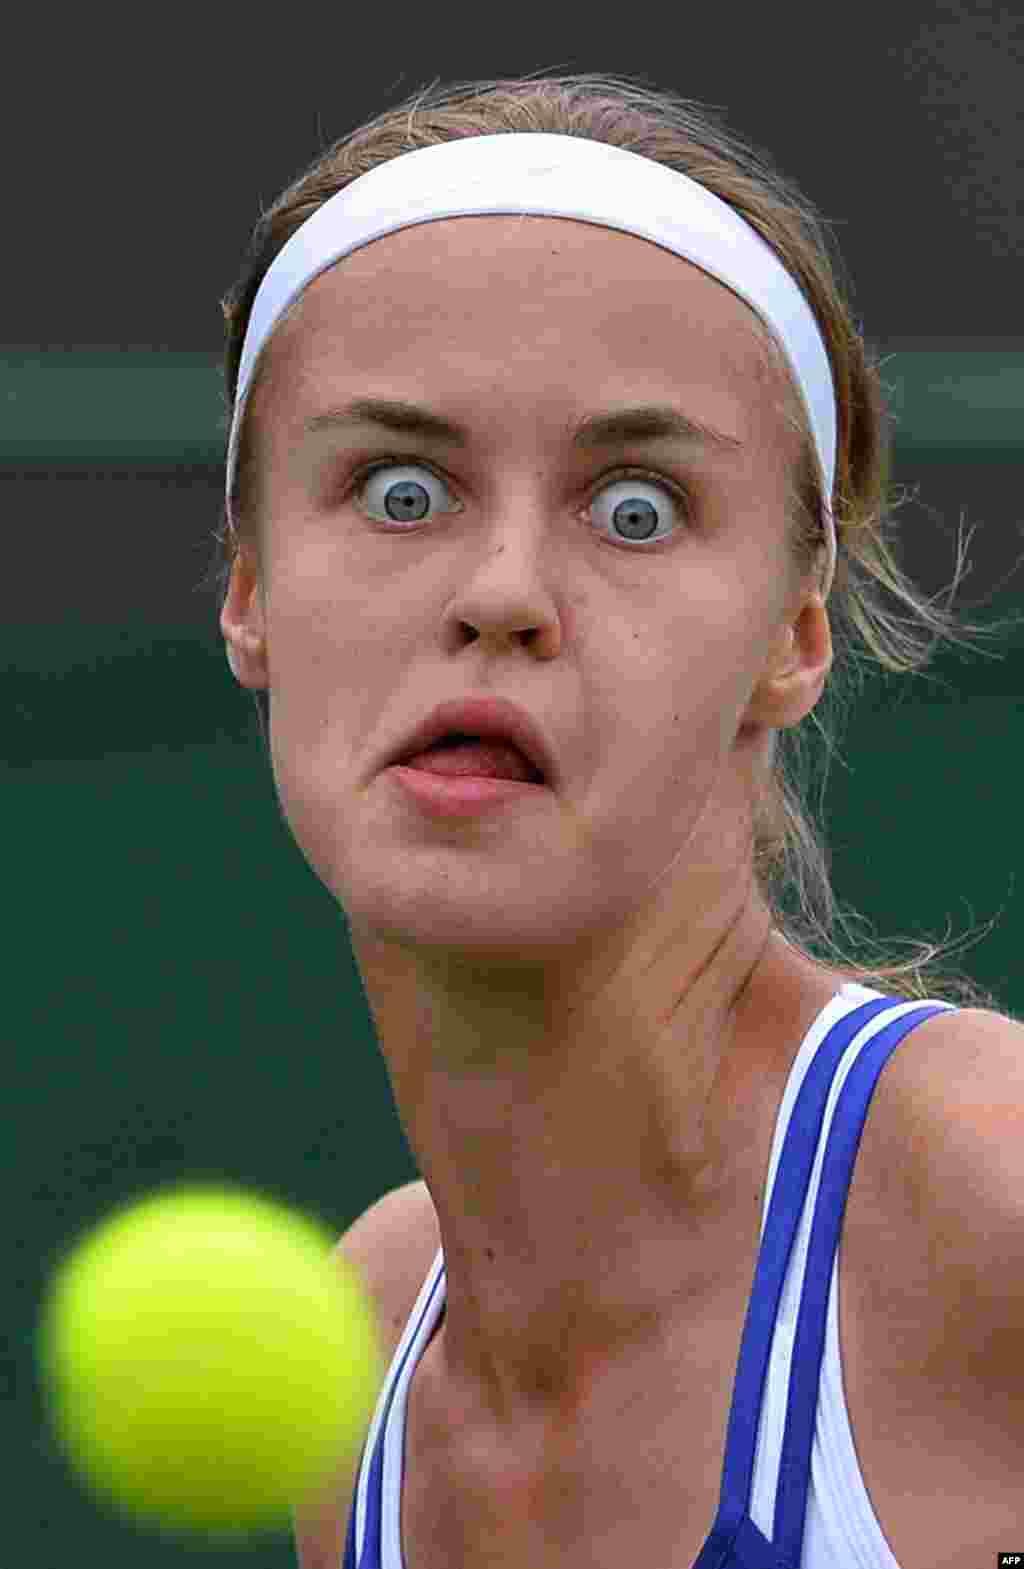 Slovakia's Anna Schmiedlova eyes the ball for a return against Australia's Samantha Stosur during their first-round match at the Wimbledon tennis tournament. Stosur won 6-1, 6-3. (AFP/Carl Court)